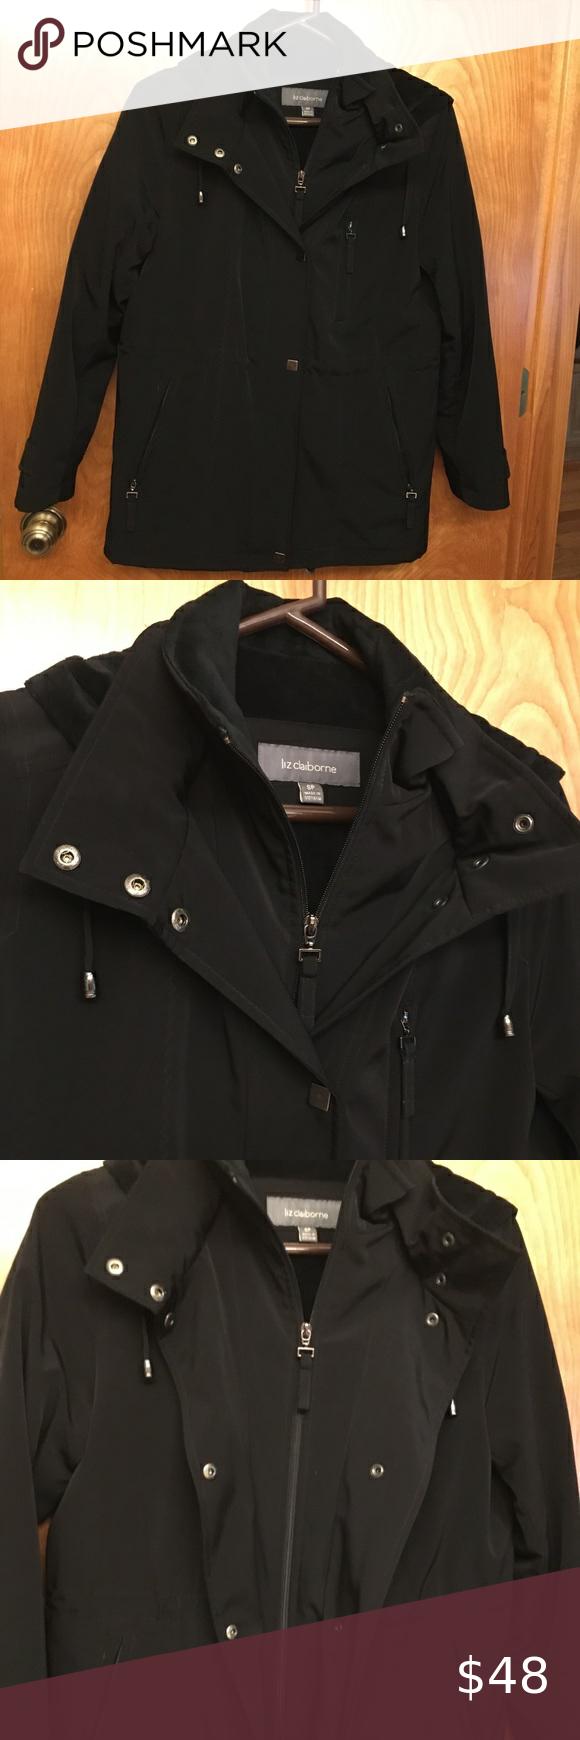 Liz Claiborne Winter Jacket Size Small Petite Winter Jackets Jackets Liz Claiborne [ 1740 x 580 Pixel ]